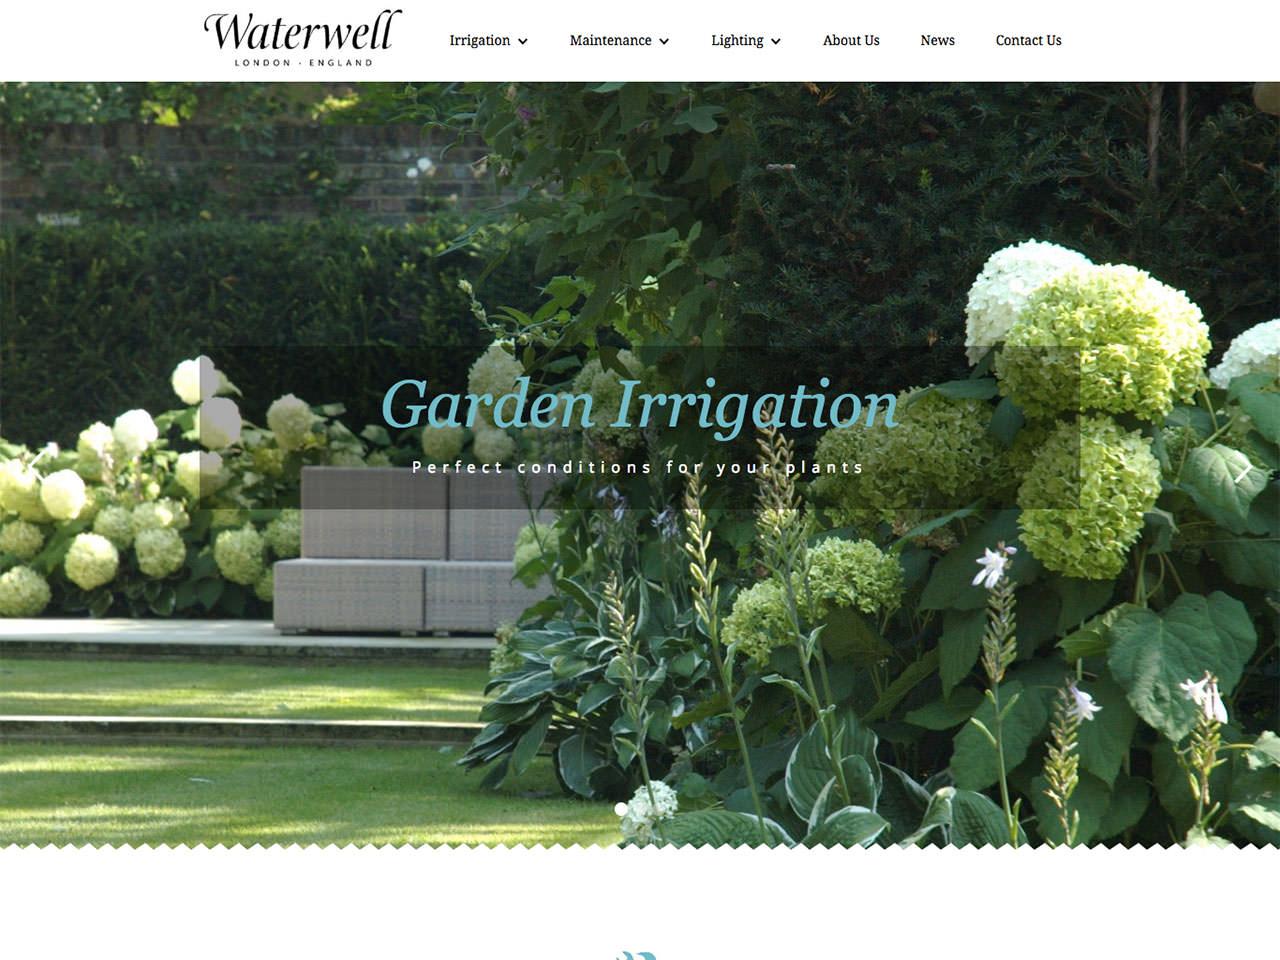 Spotlight On: Waterwell Limited